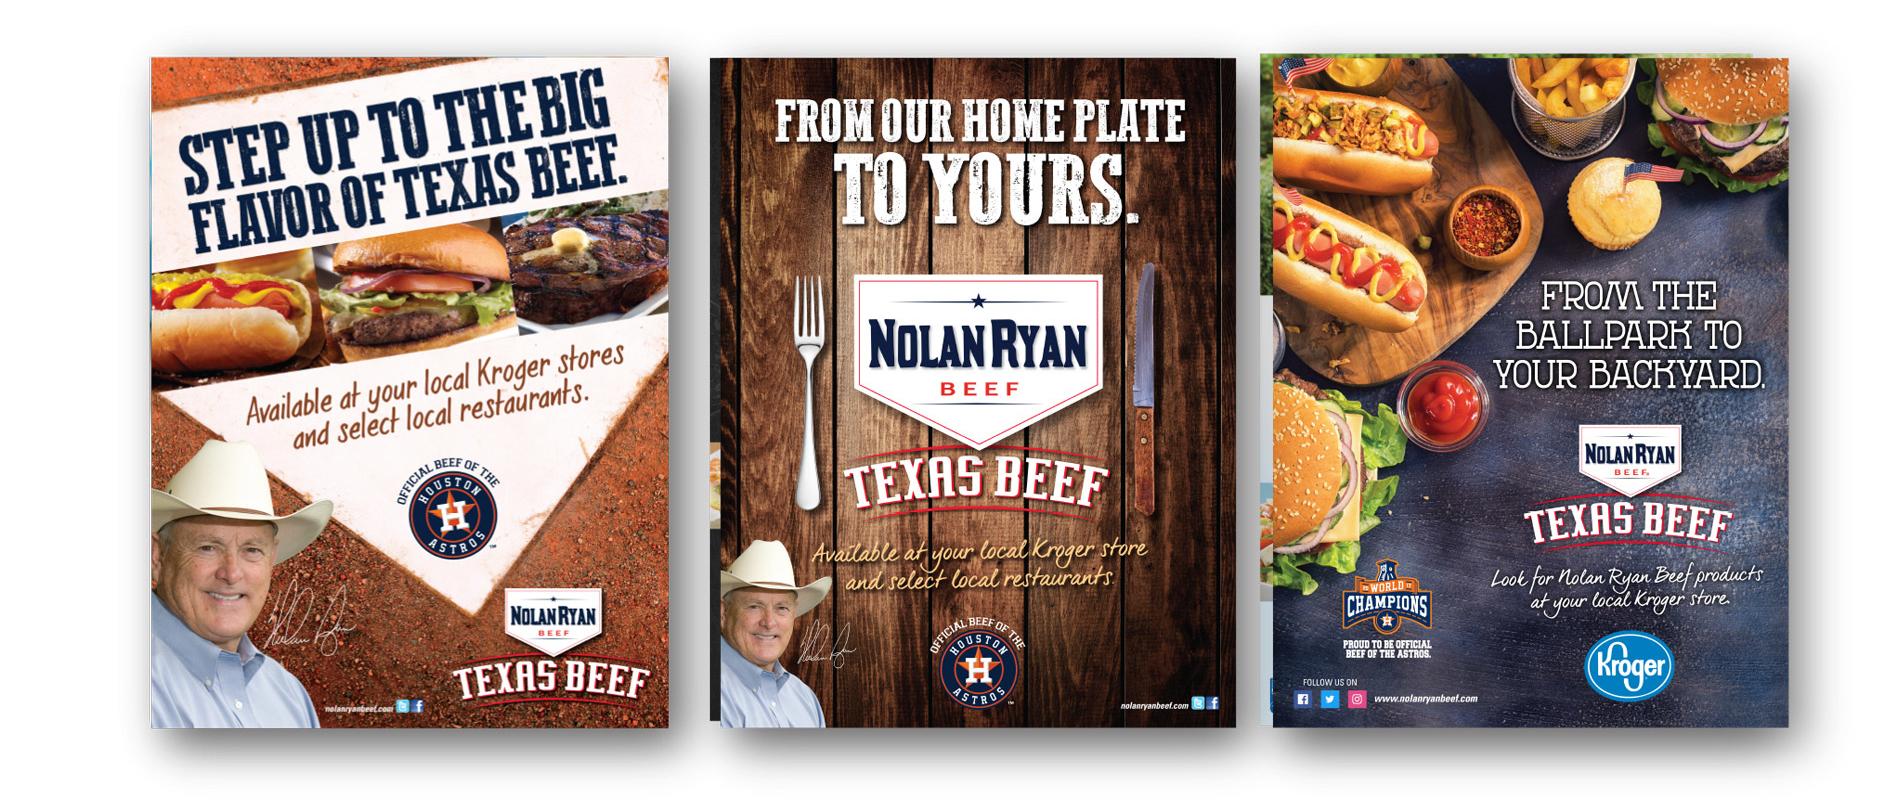 Nolan Ryan Beef Advertisements